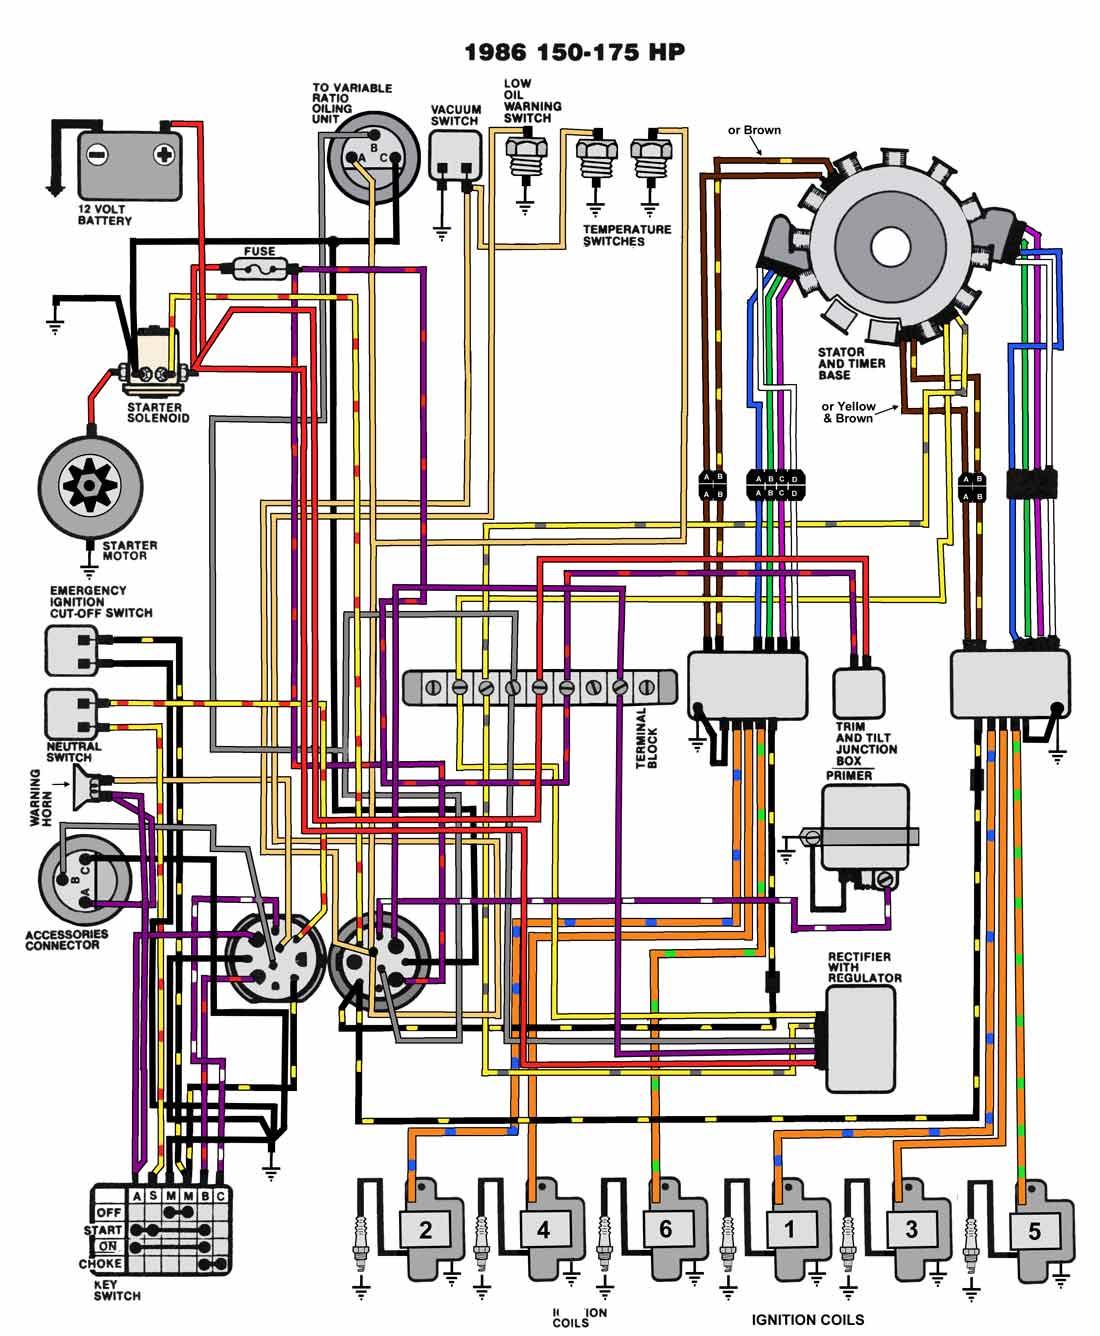 1997 Evinrude Wiring Diagram Wiring Diagrams Schematics OMC Ignition Wiring  Diagram 110 Evinrude Looper Wiring Diagram